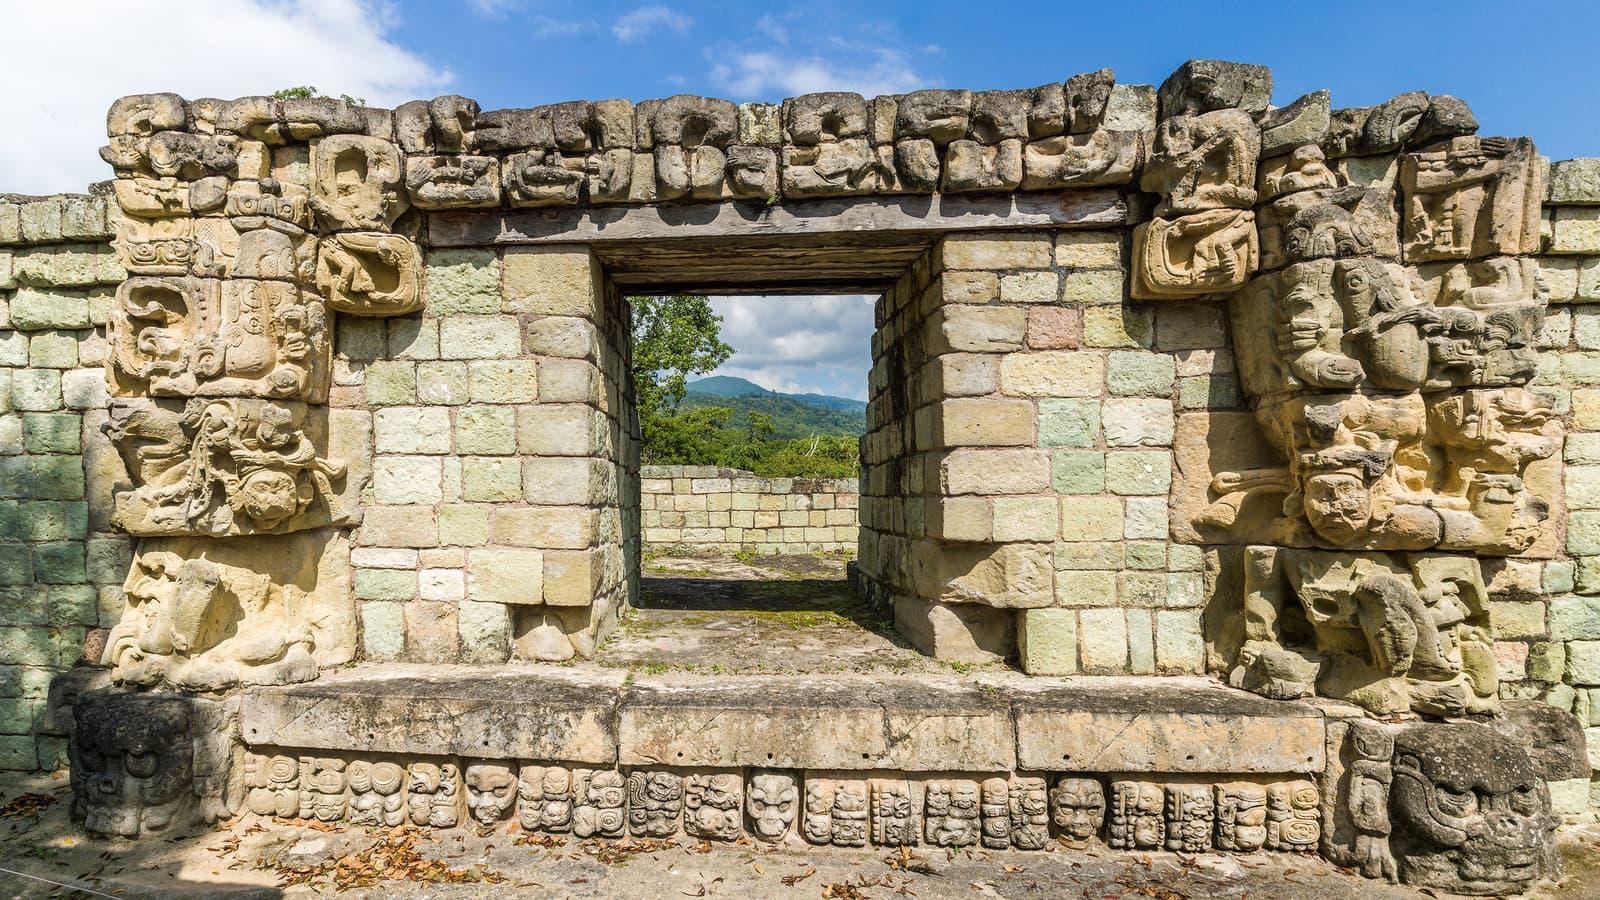 things to do in Honduras, backpacking Honduras, places to visit in Honduras, Honduras travel guide, Honduras travel itinerary, best time to visit Honduras